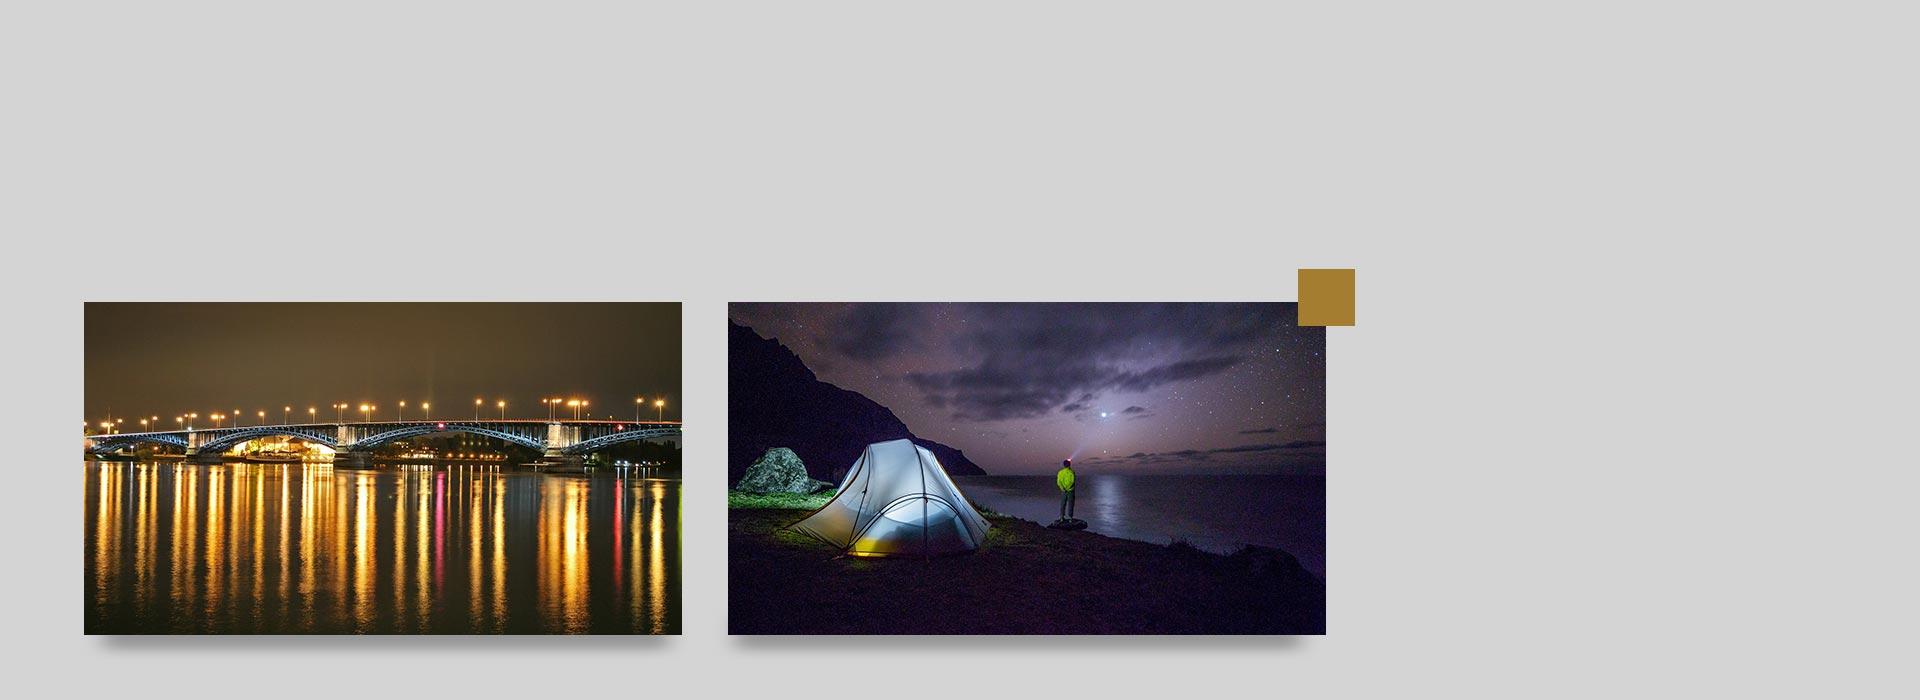 Exposures for Night Photography - عکاسی در شب